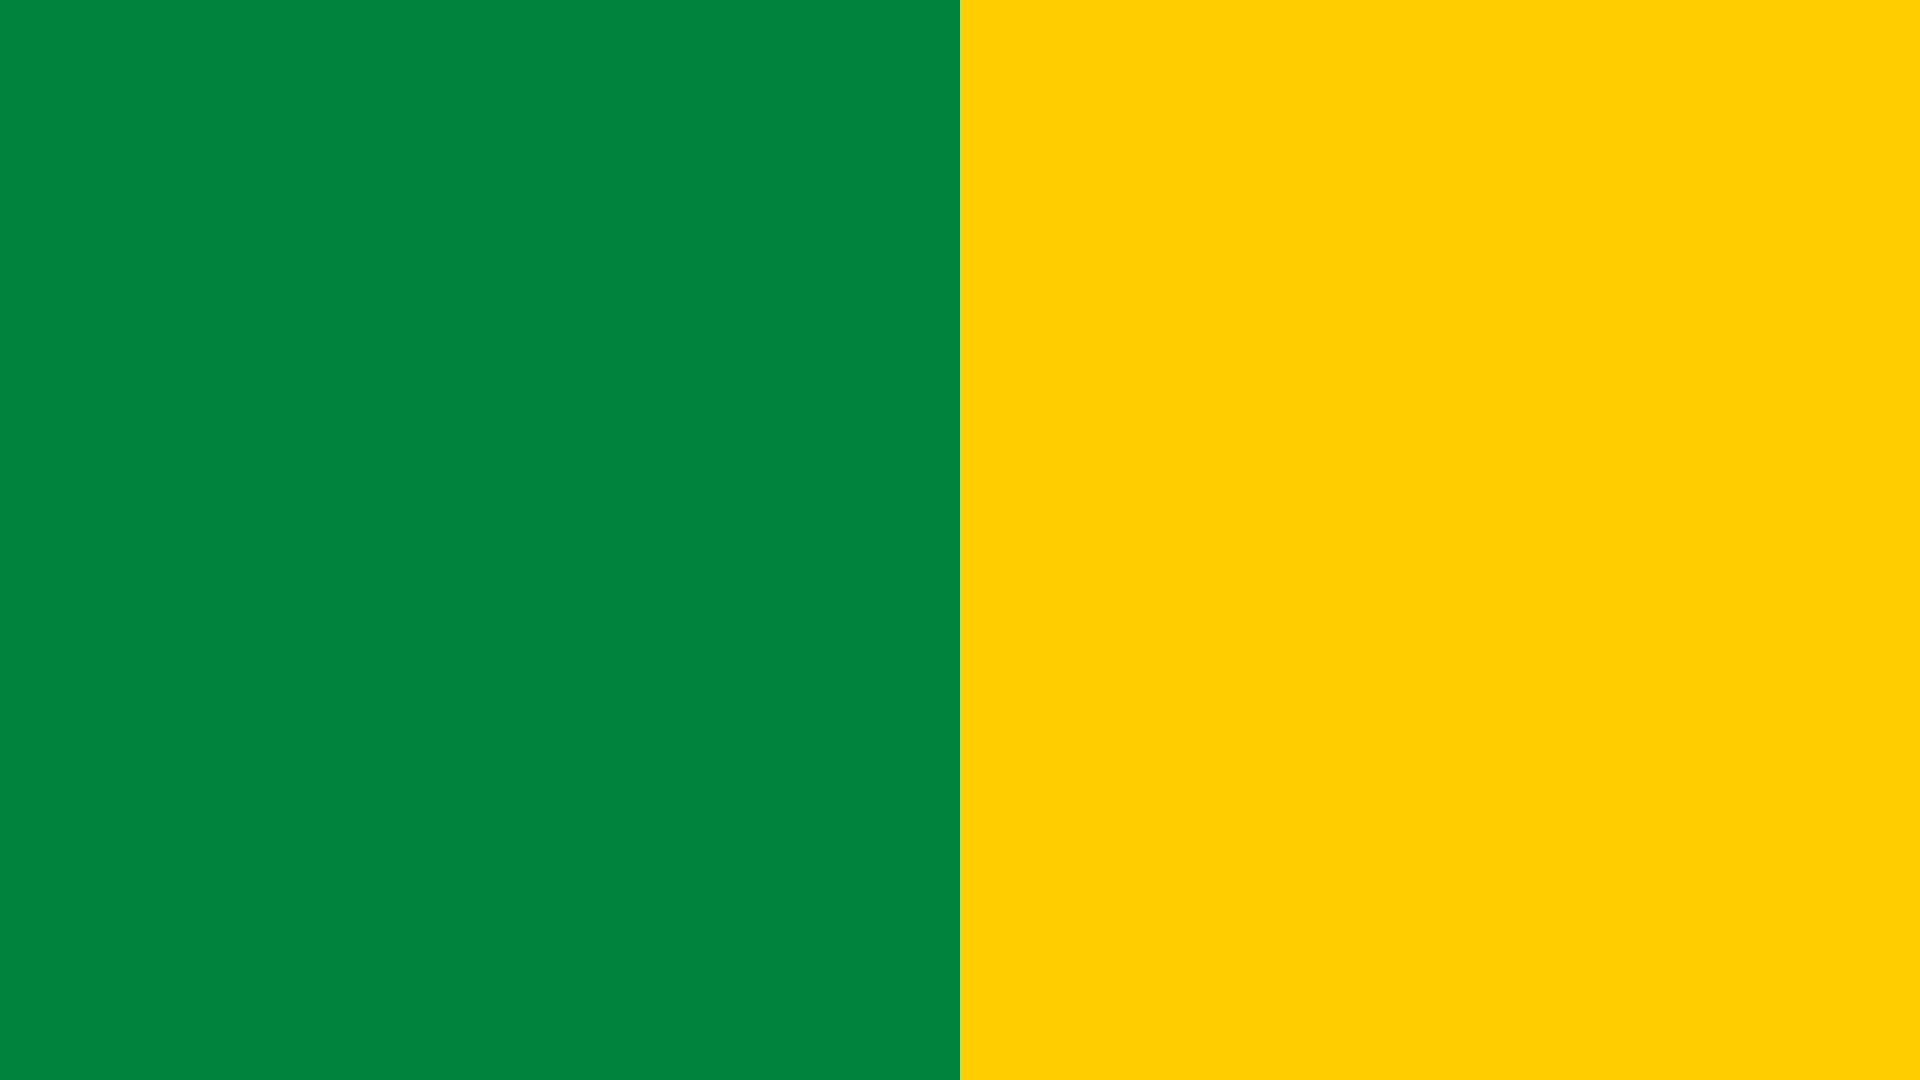 Australia Yellow And Green Color Scheme